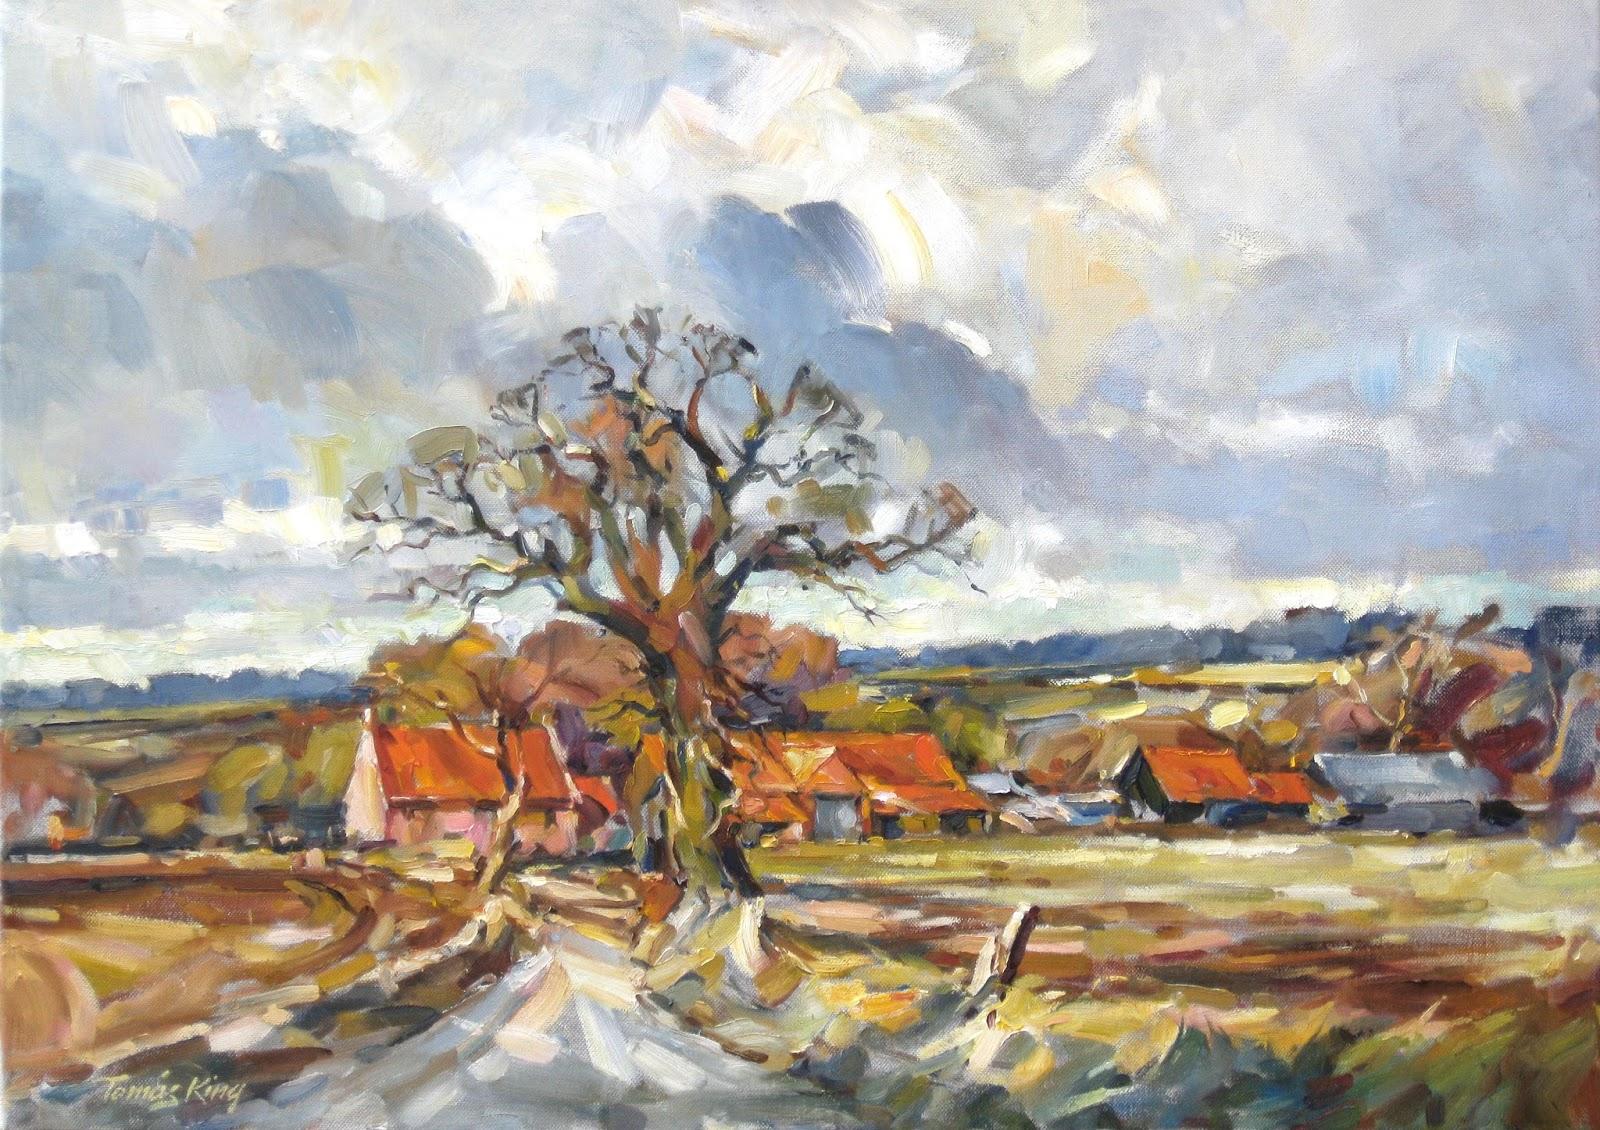 Studio Tomas King